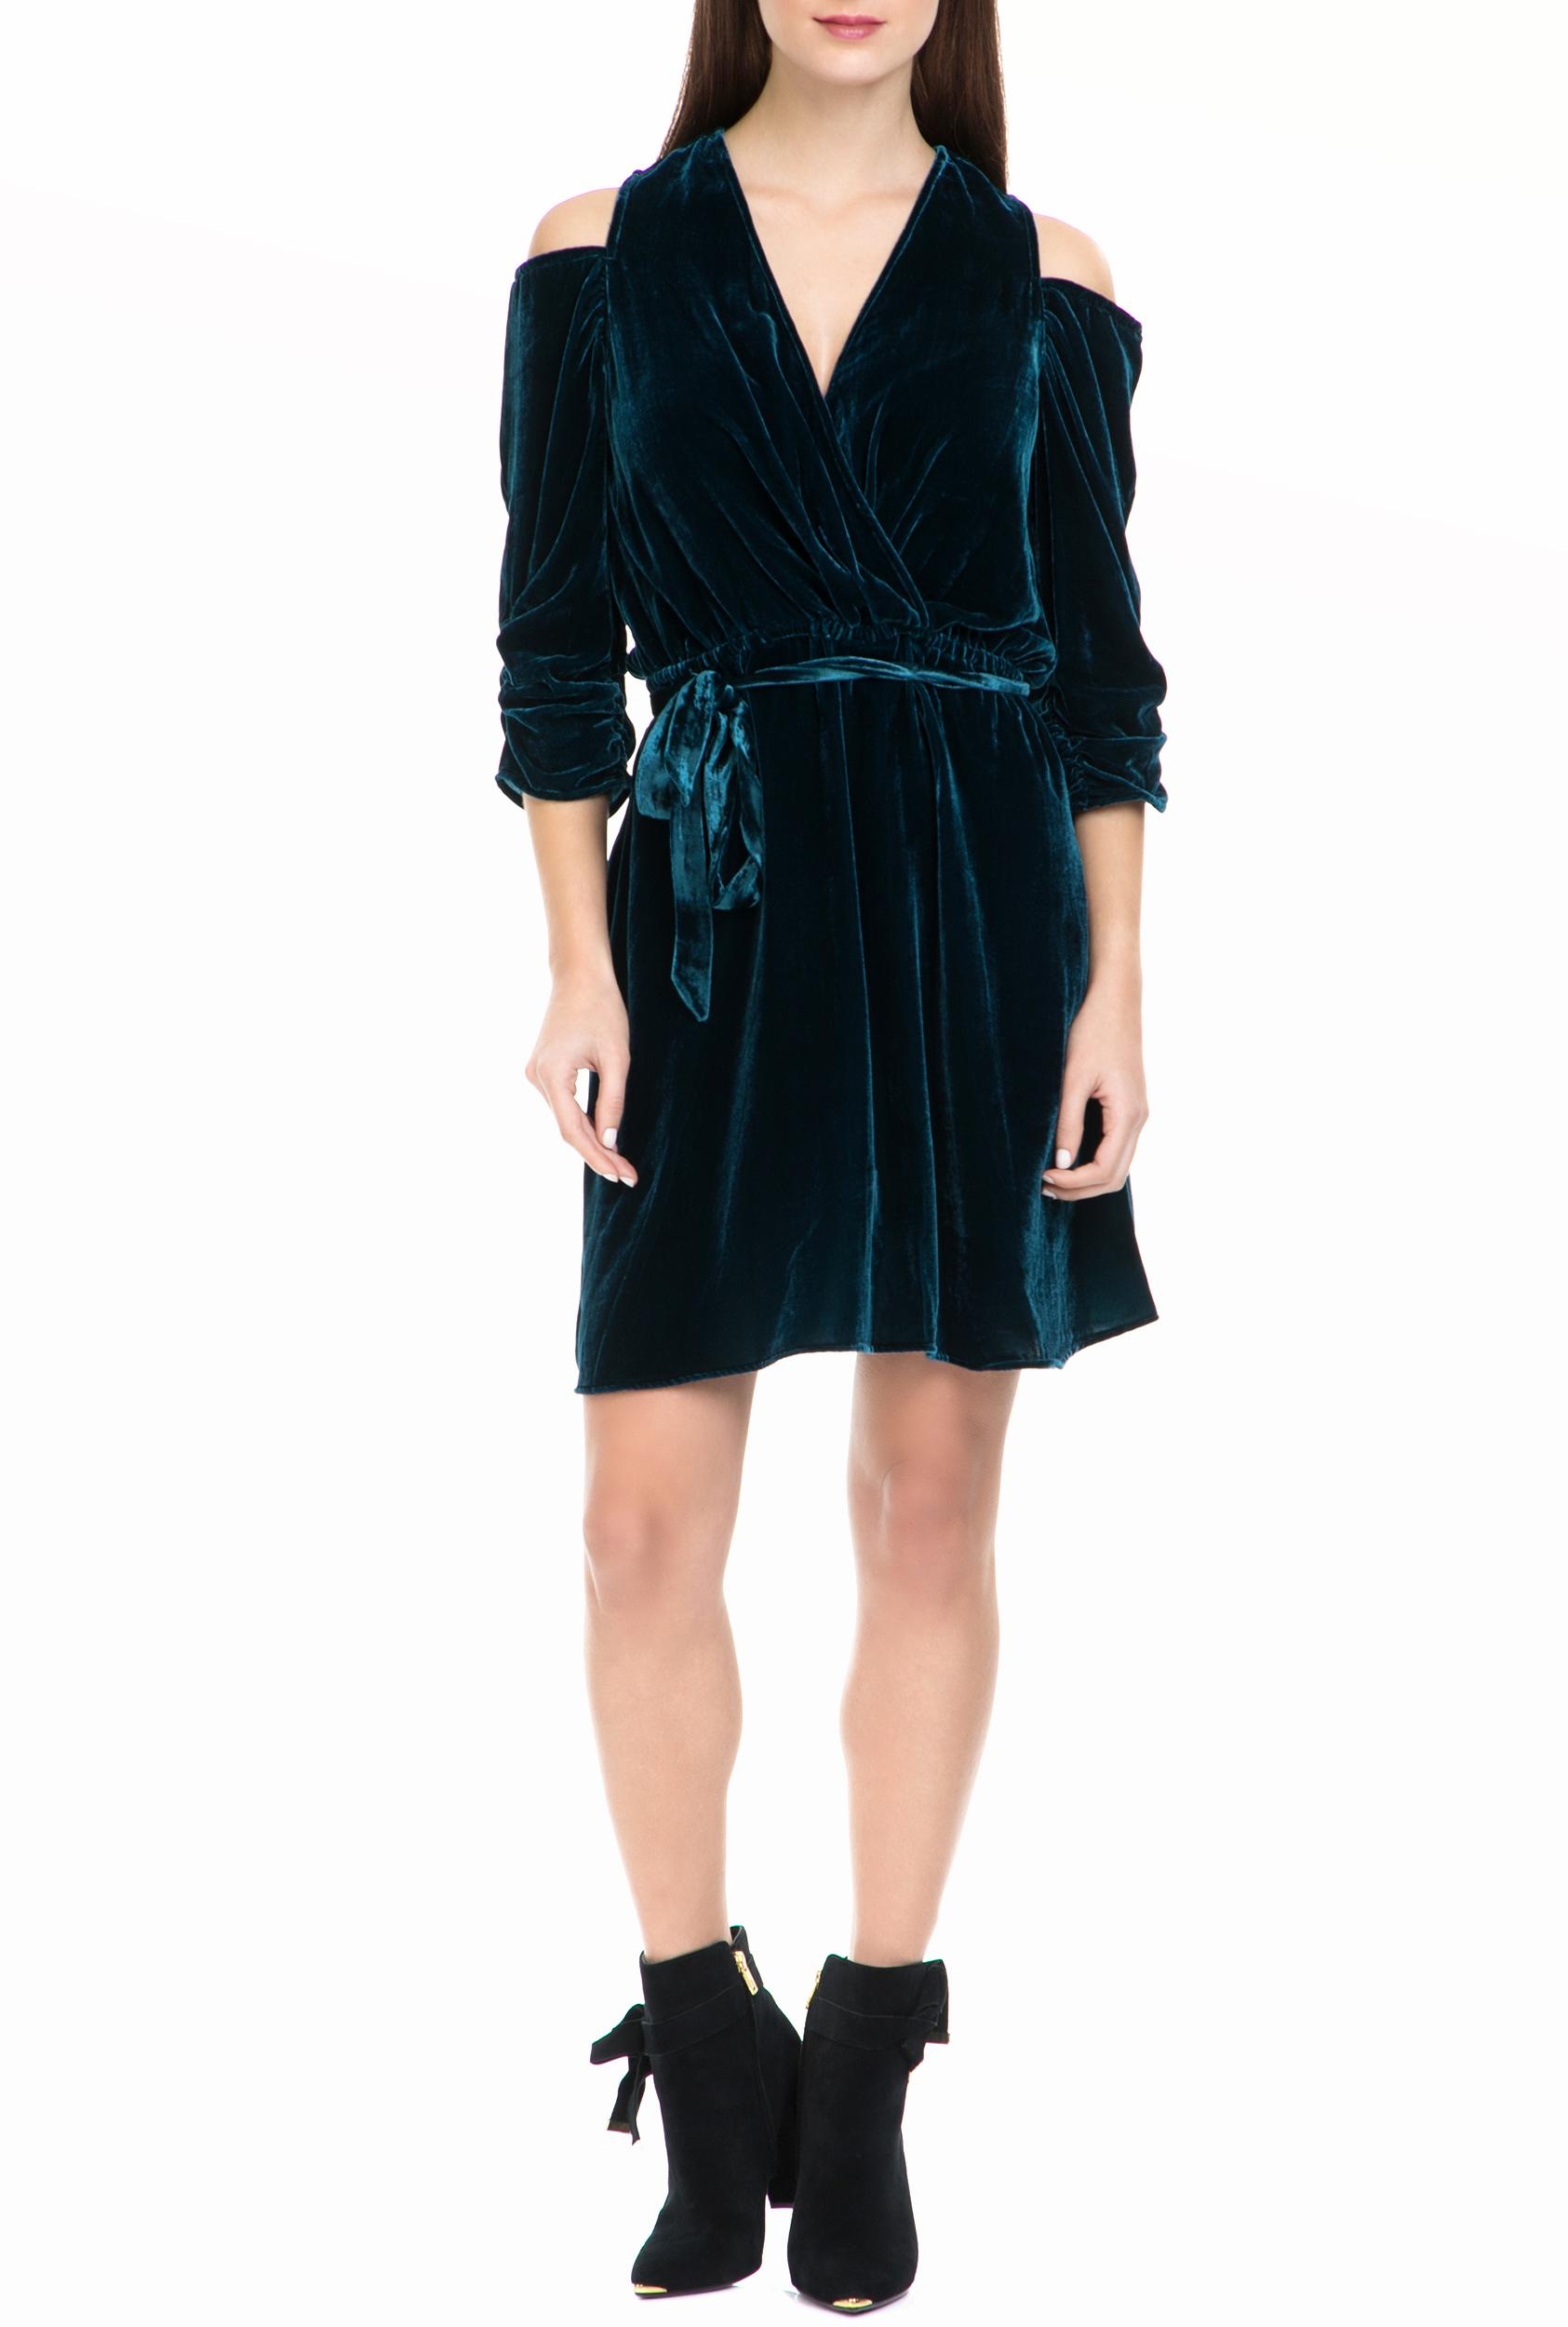 HALE BOB - Γυναικείο φόρεμα HALE BOB πράσινο γυναικεία ρούχα φόρεματα μίνι